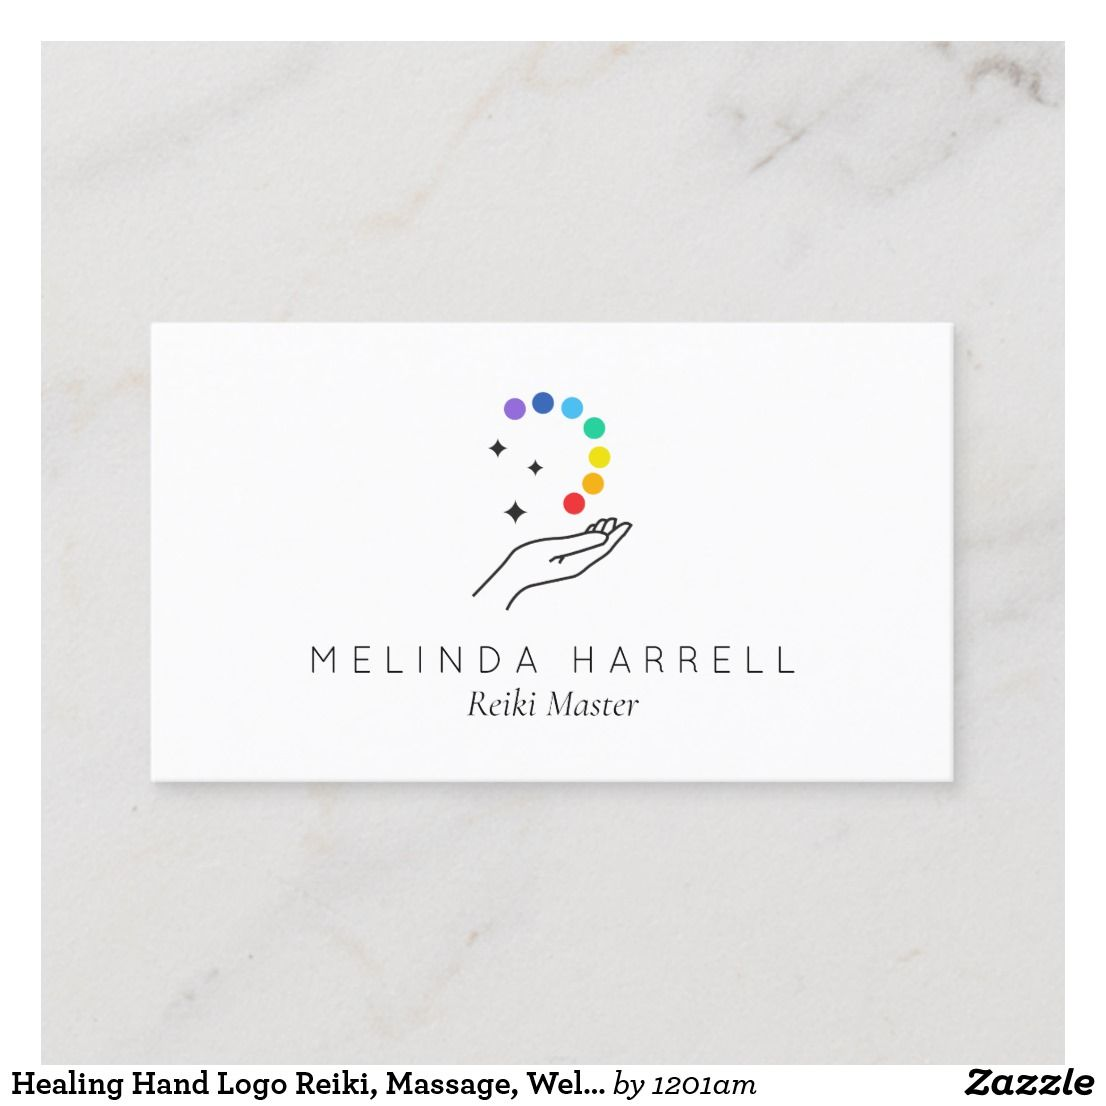 Healing Hand Logo Reiki Healer Wellness Business Card Zazzle Com In 2021 Hand Logo Healing Logo Massage Logo